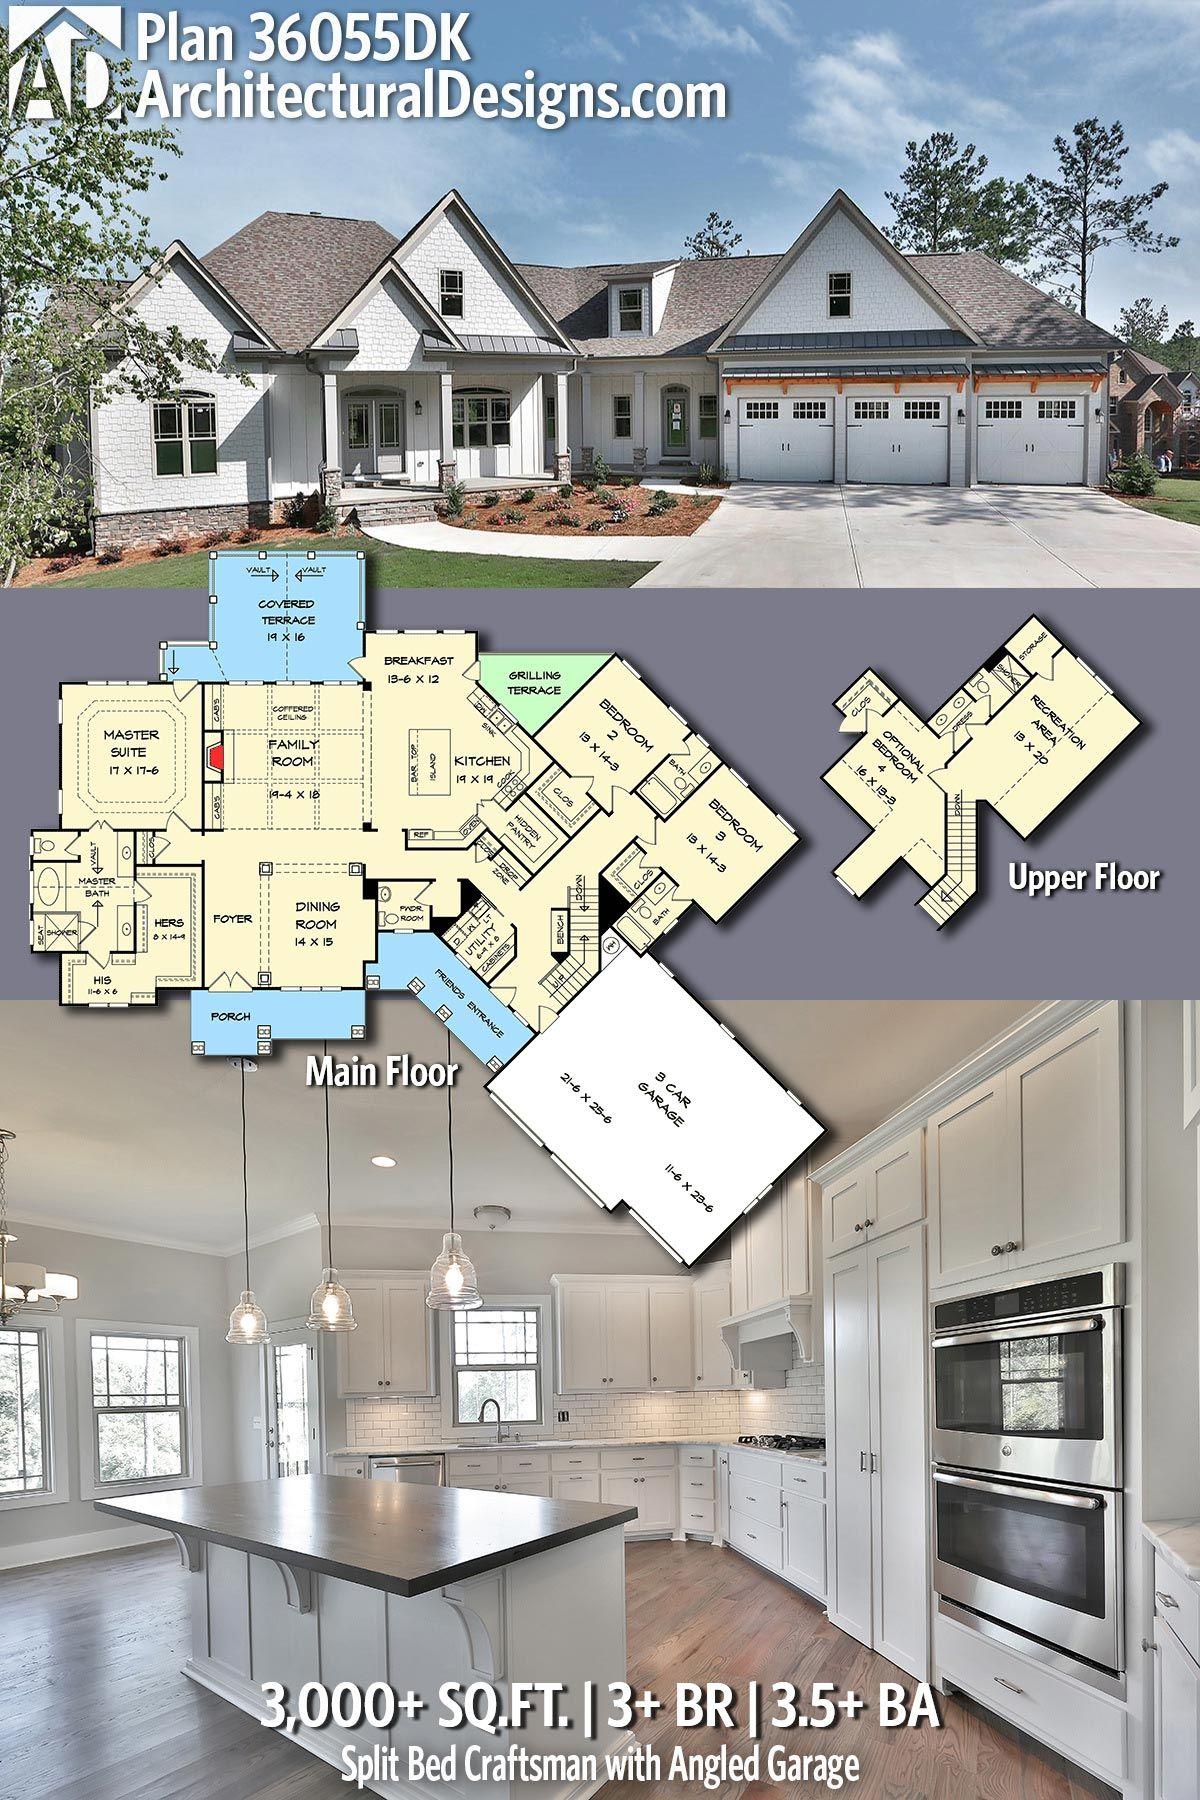 Architectural Designs Craftsman House Plan 36055DK has